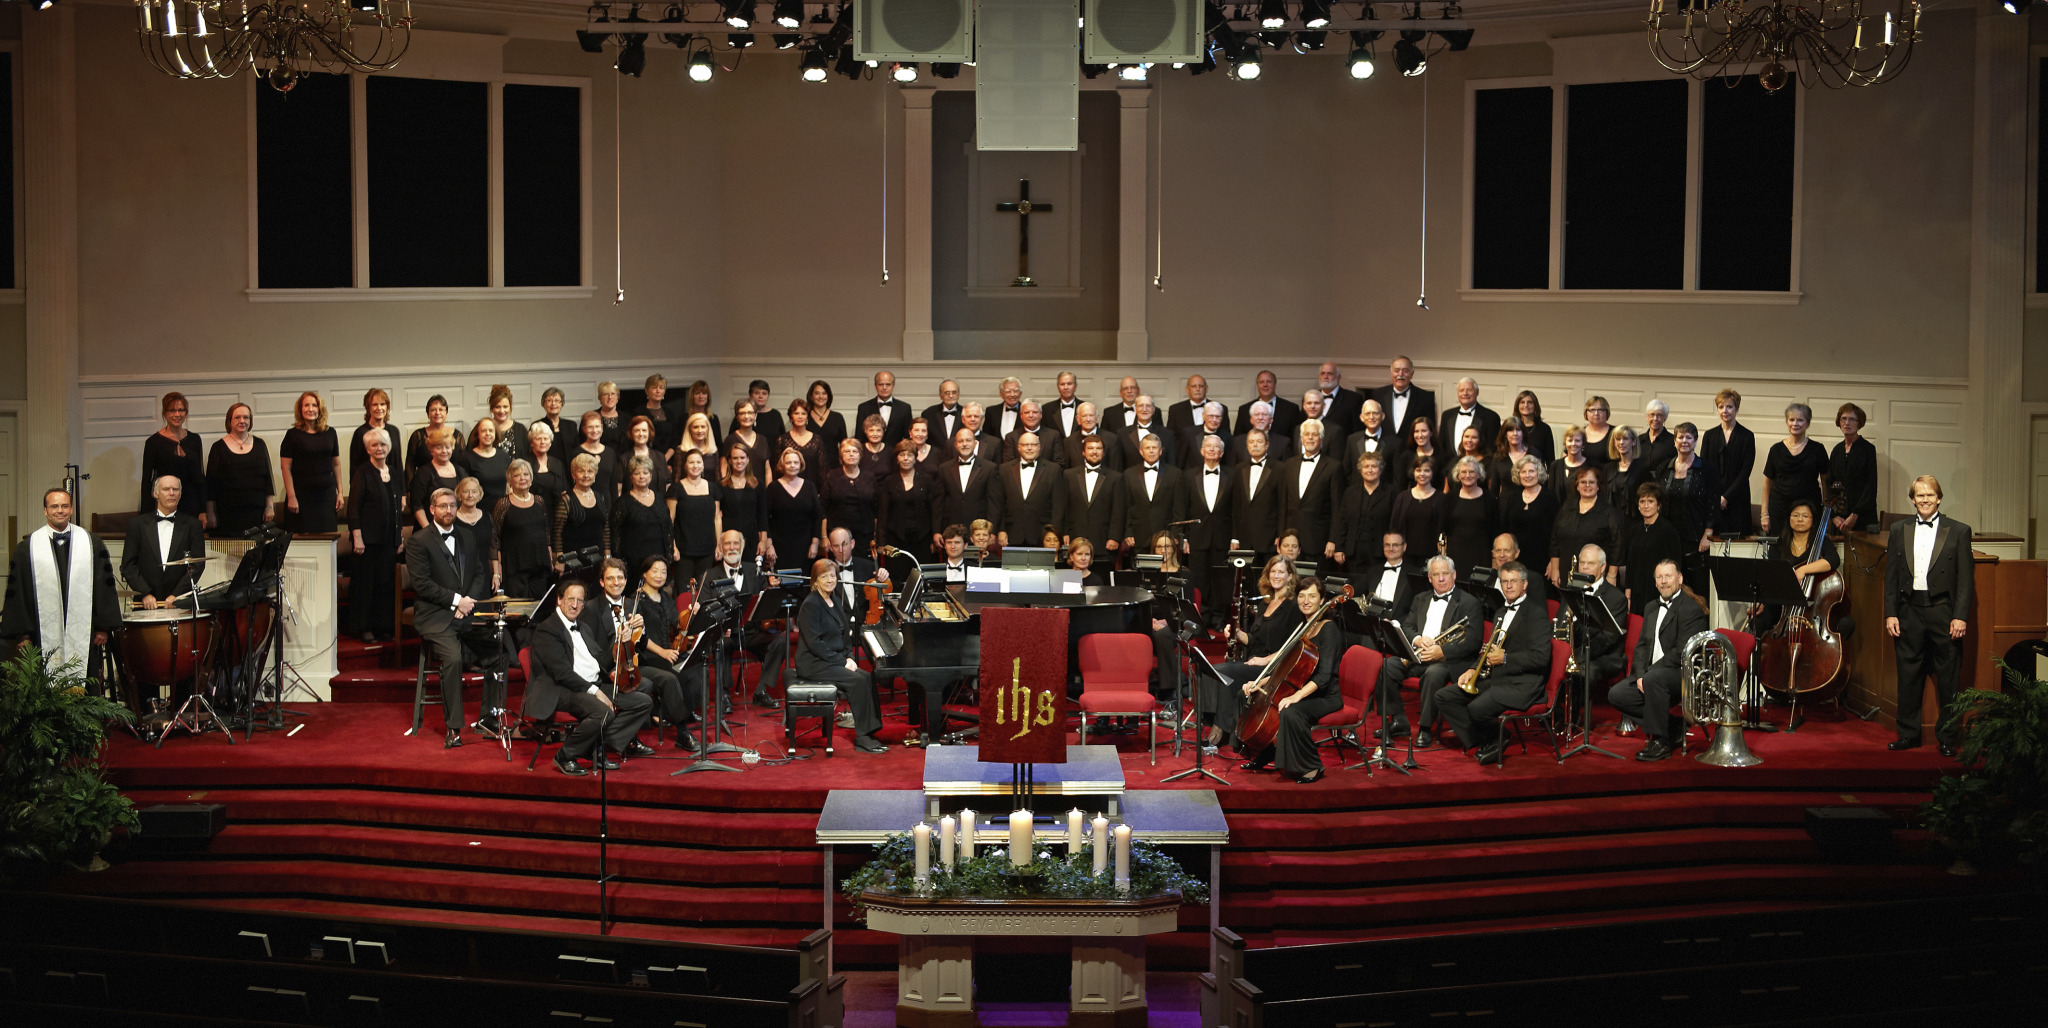 Bonsack Baptist Church, Roanoke, VA